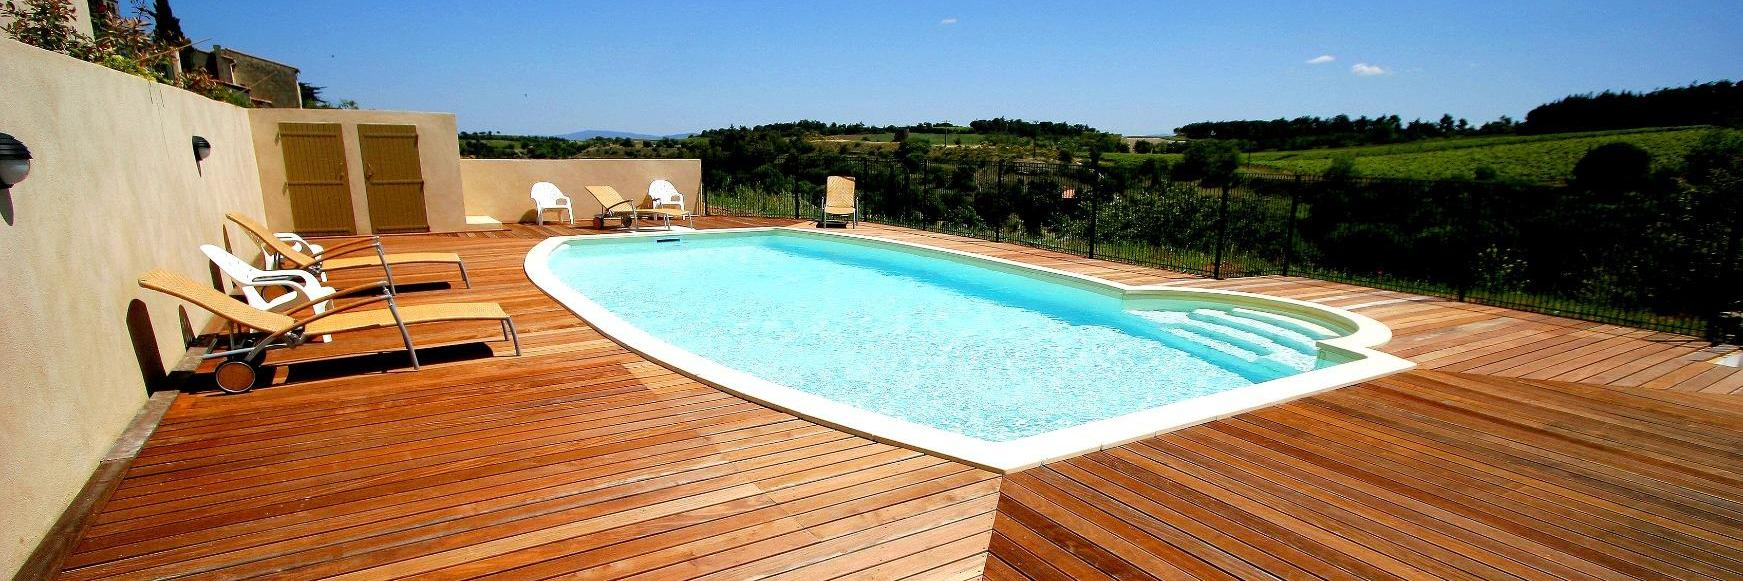 H tel carcassonne dans aude restaurants logis hotels for Oplus piscine carcassonne